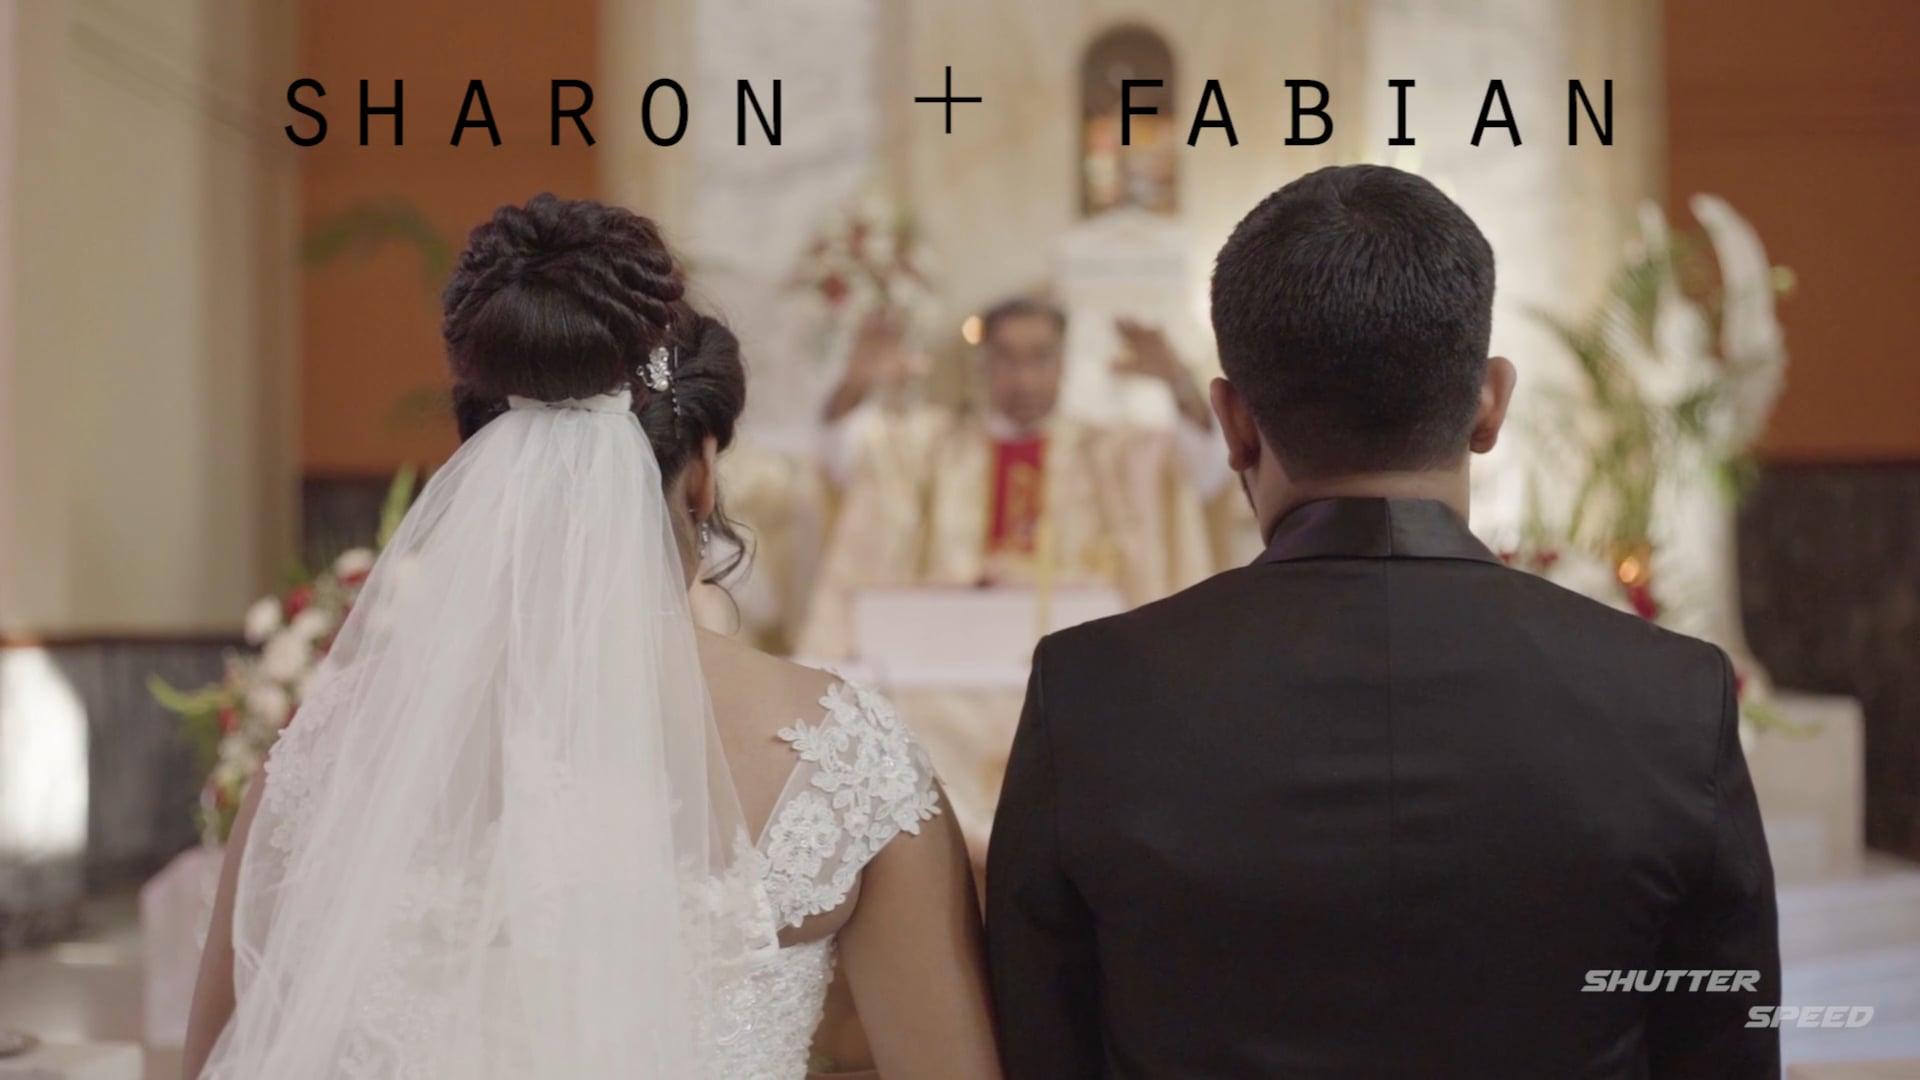 Sharon weds Fabian